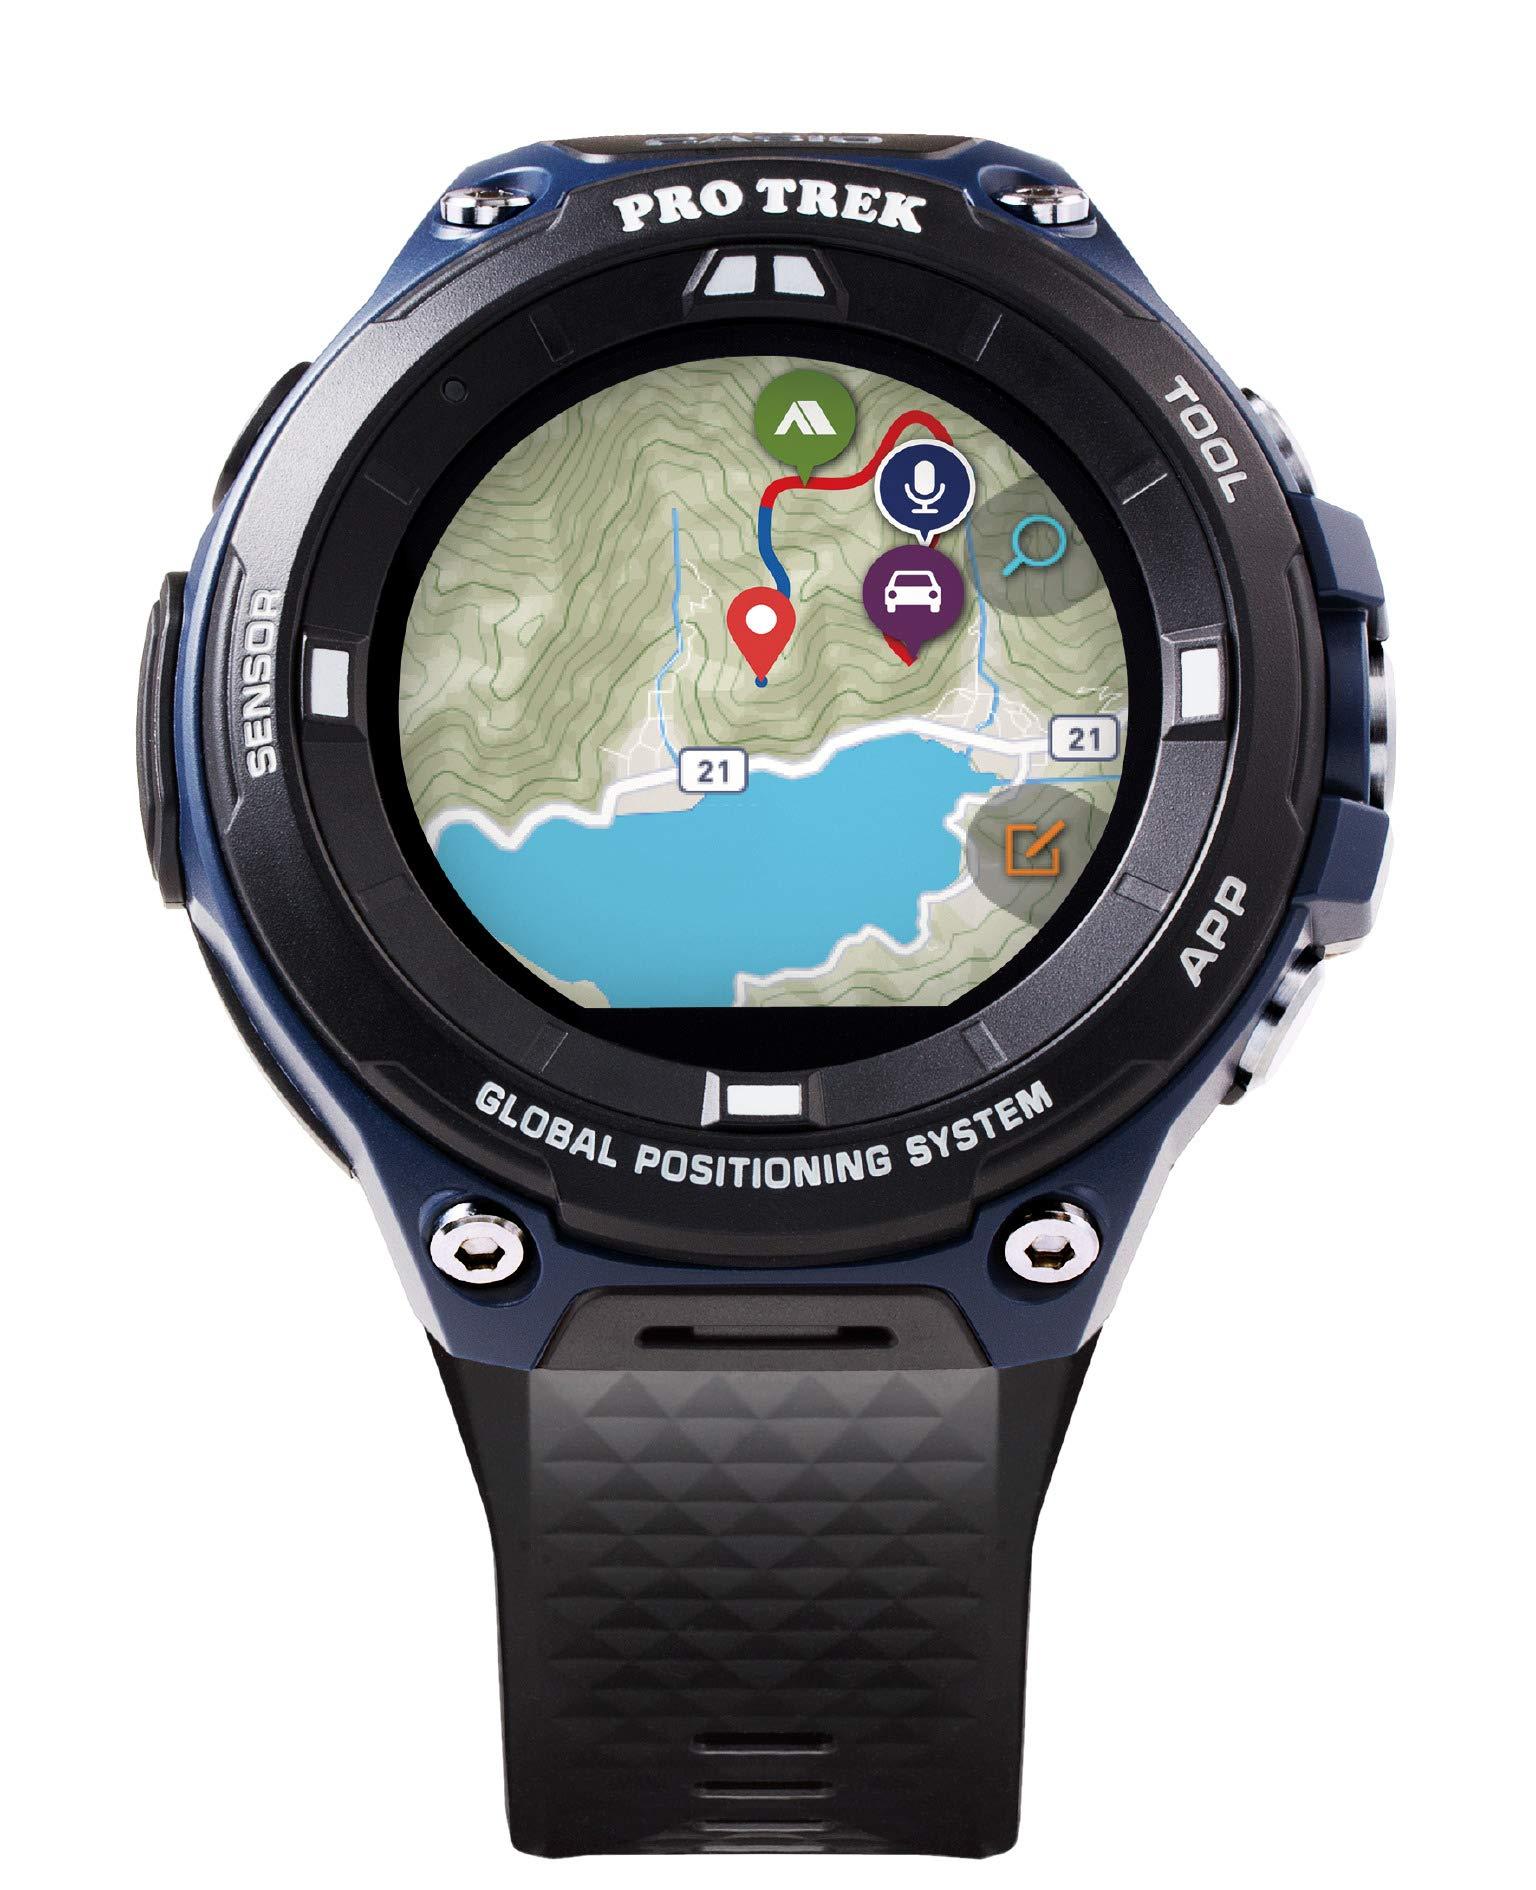 Casio Men's ''Pro Trek'' Outdoor GPS Resin Sports Watch, Color: Black & Indigo Blue (Model WSD-F20A-BUAAU)